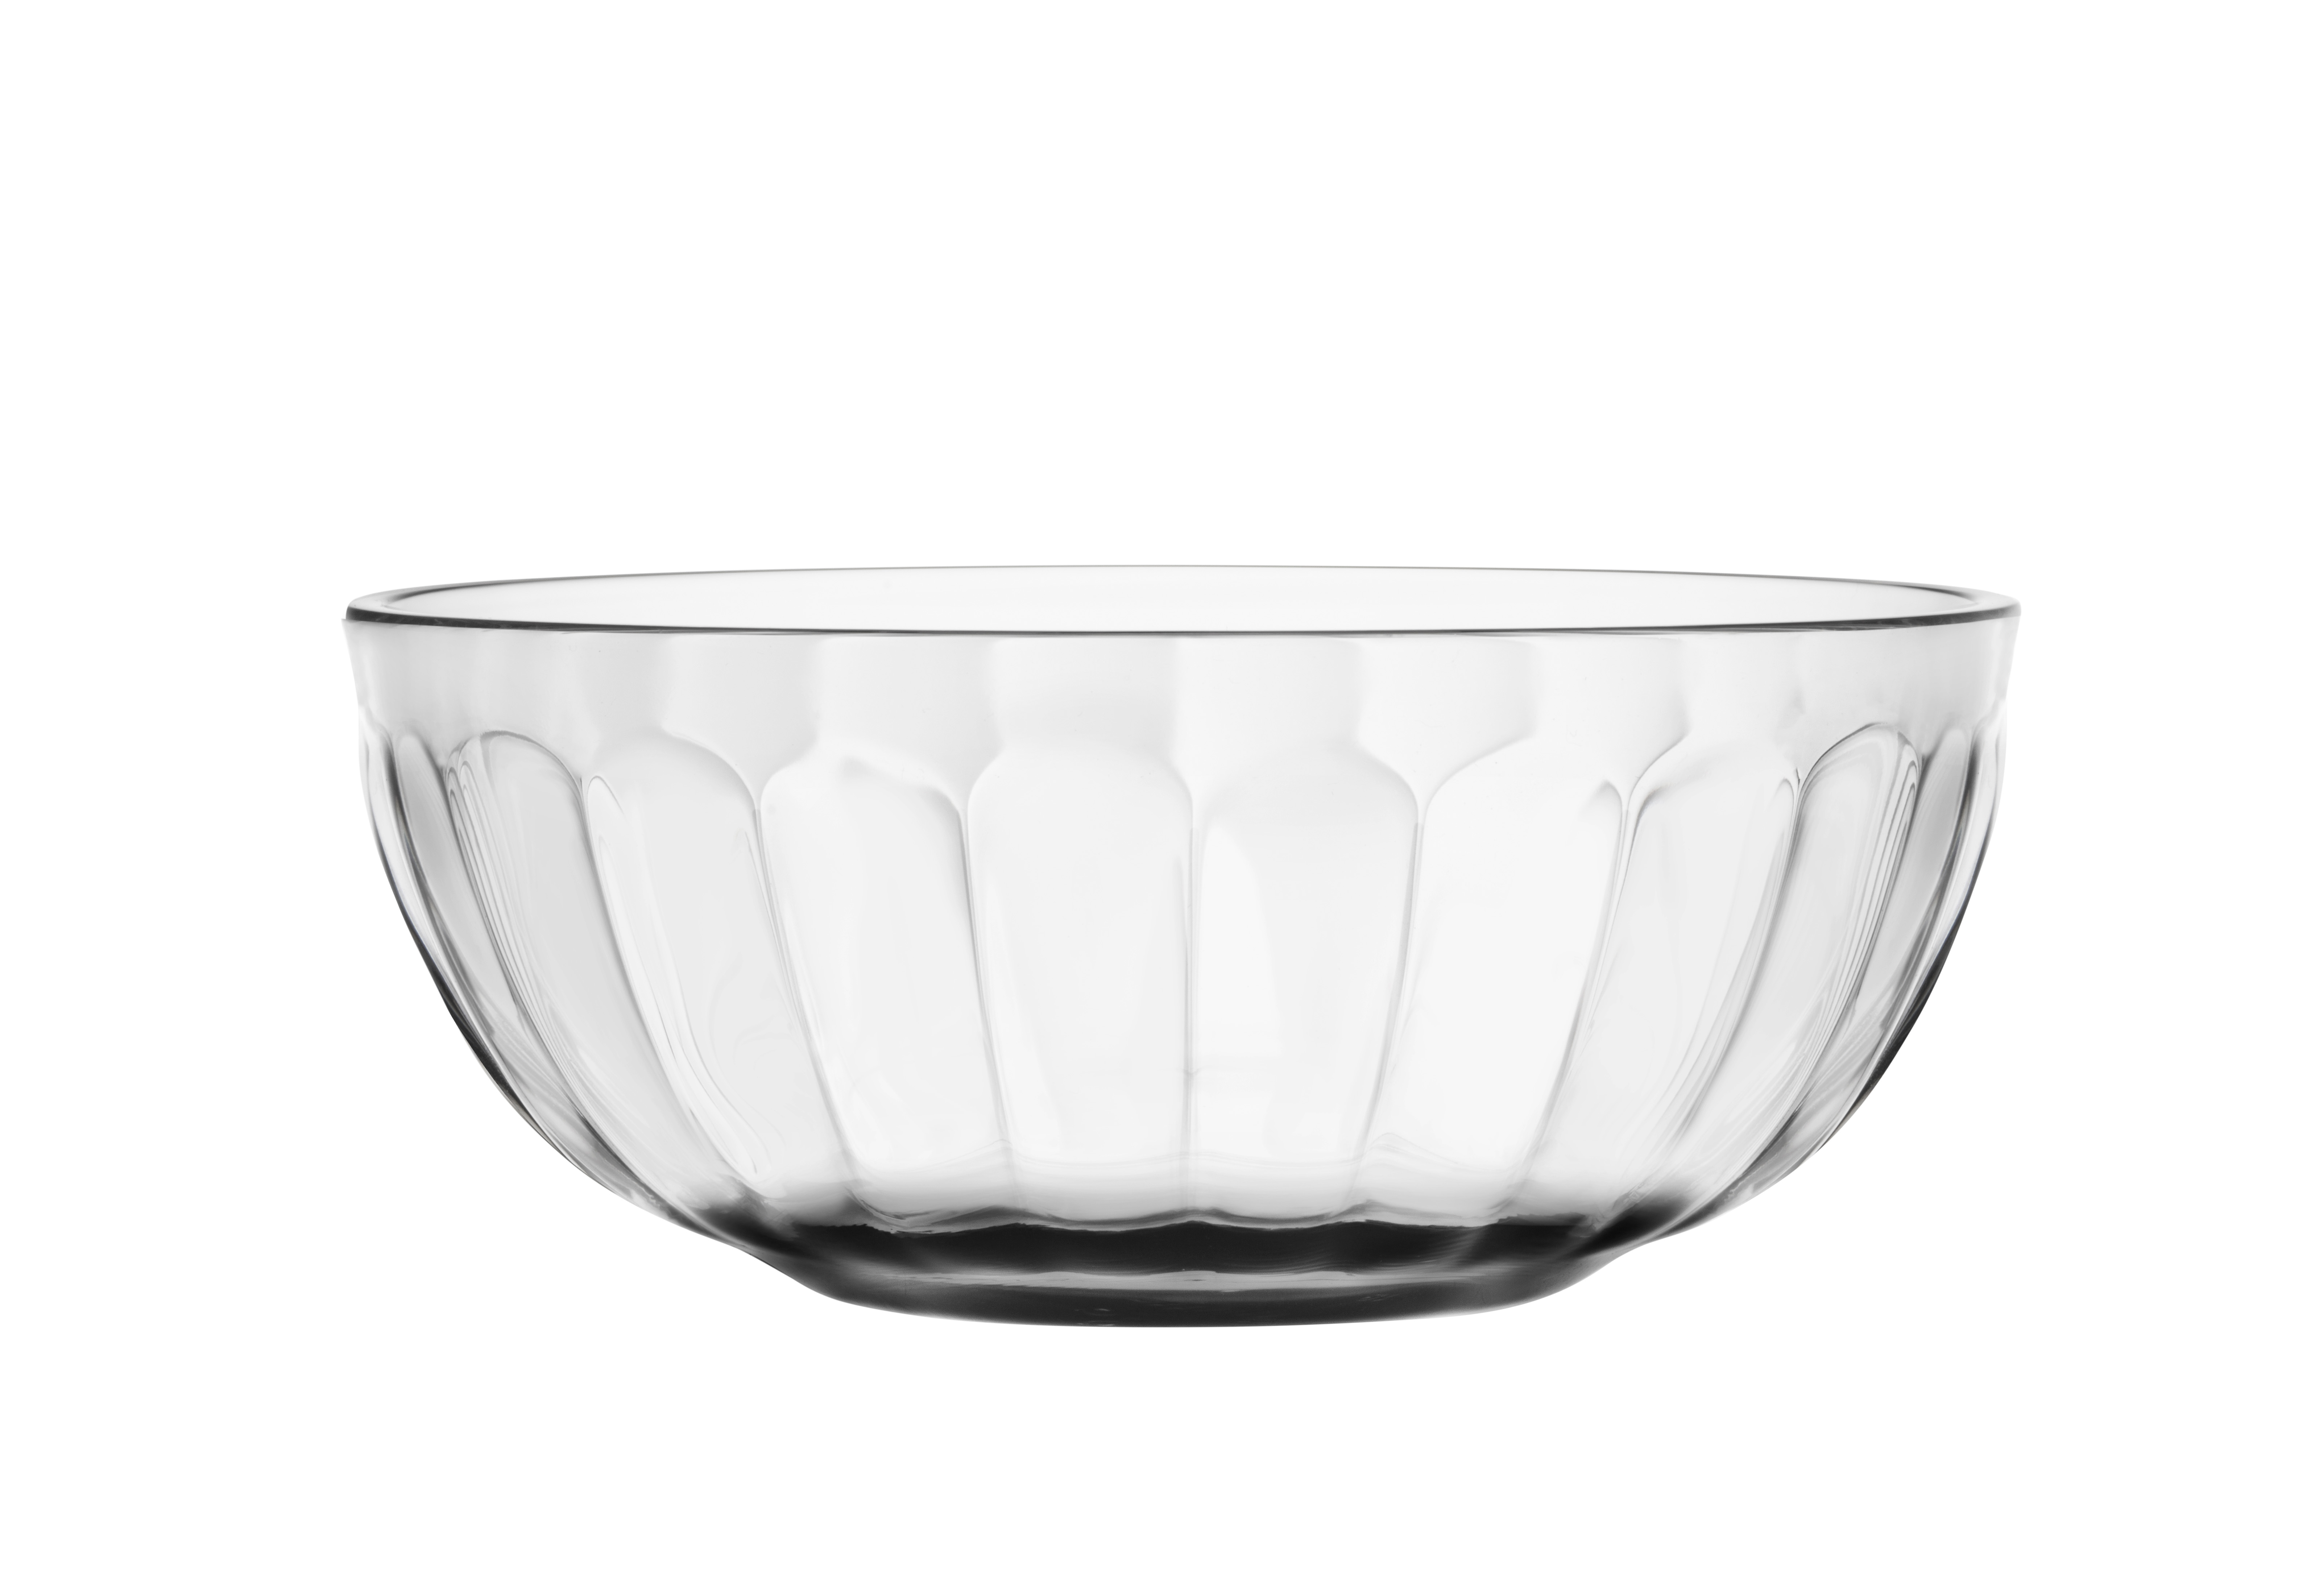 Iittala Raami skål, 360 ml, klar